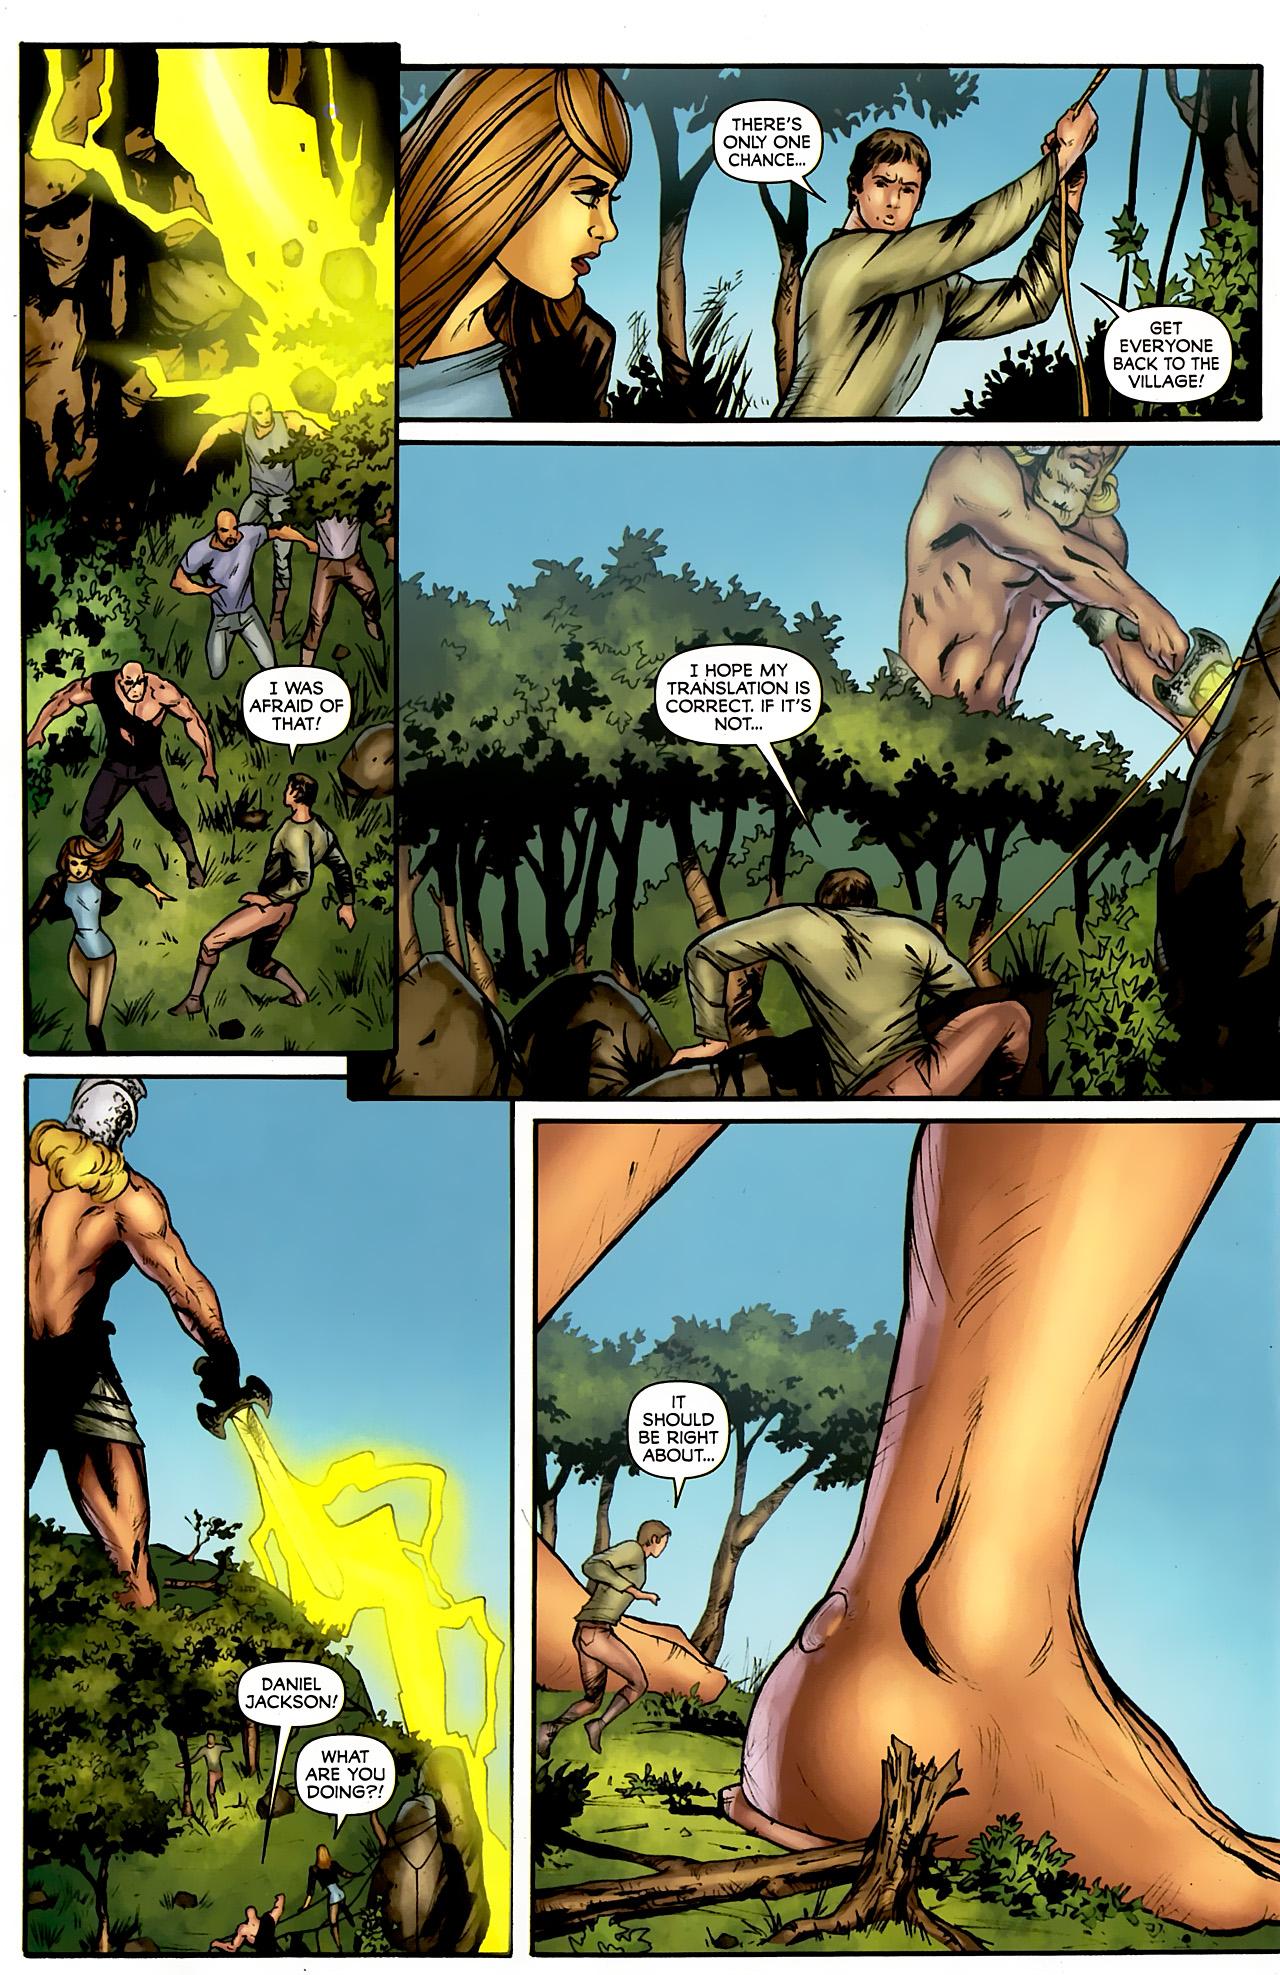 Read online Stargate: Daniel Jackson comic -  Issue #4 - 20